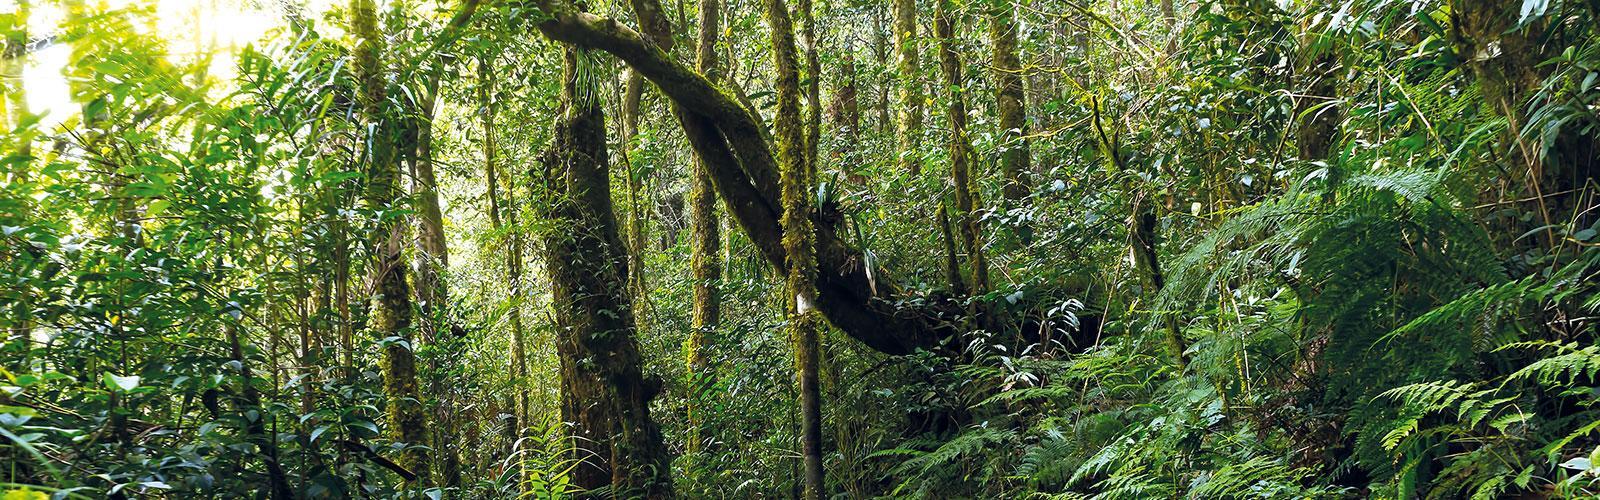 Forêt humide naturelle, parc Kinabalu, Malaisie.  © Mrfiza, Adobe Stock